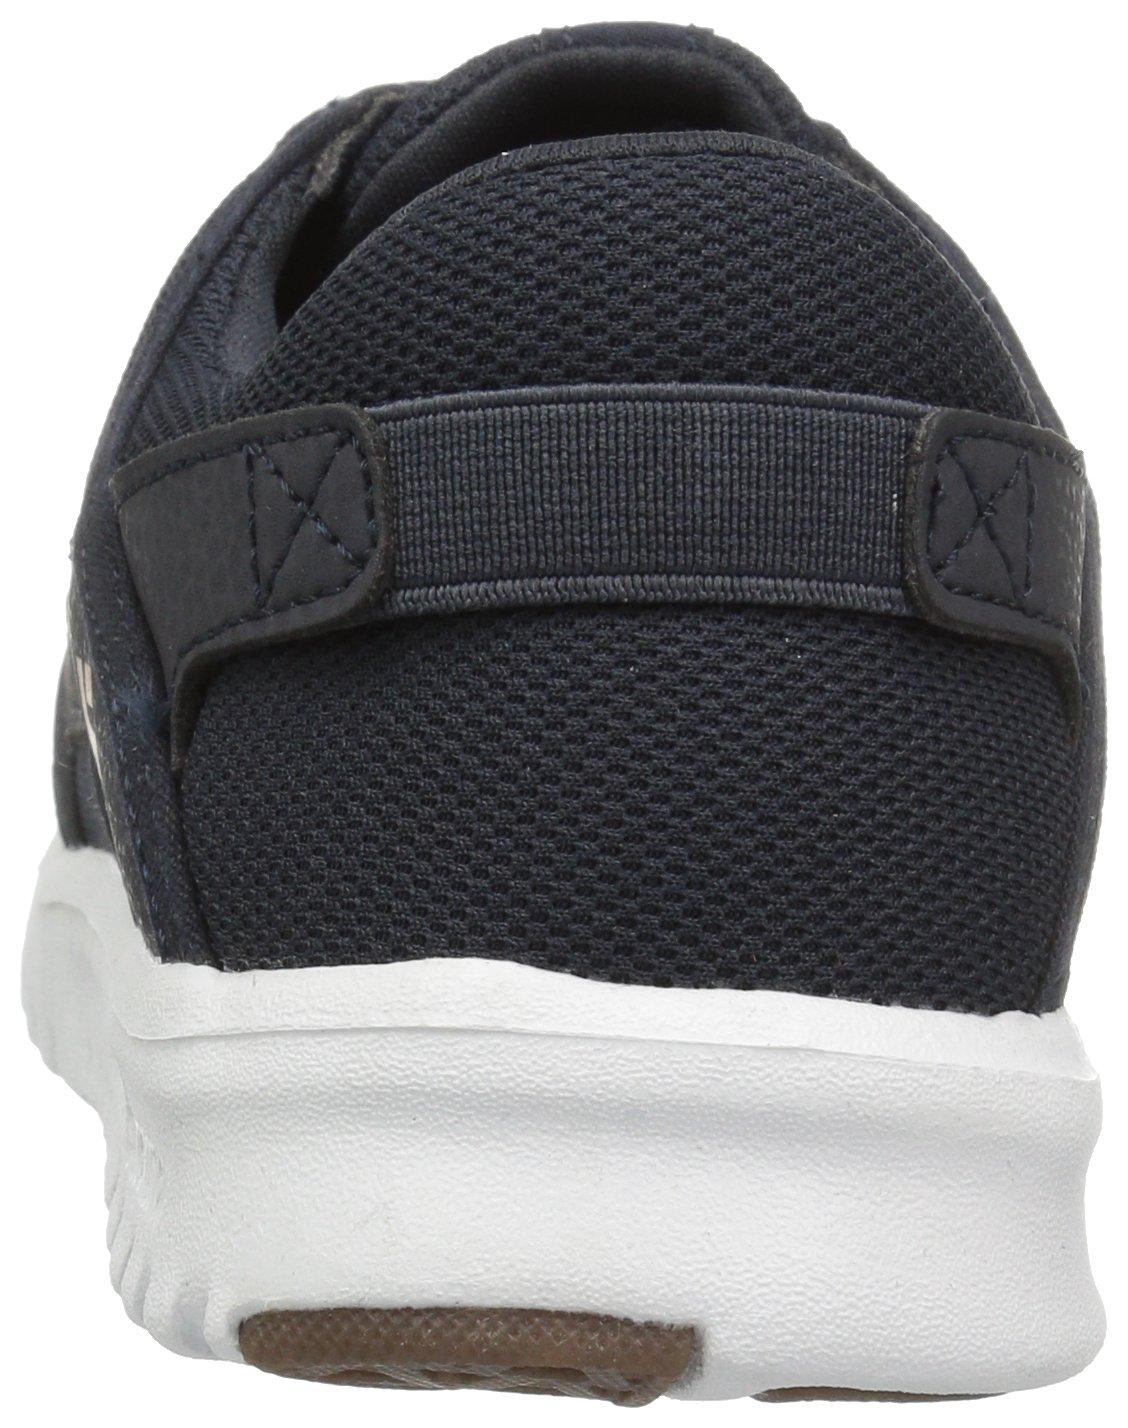 Etnies Womens Scout 7.5 Sneaker B01DODMQ1A 7.5 Scout B(M) US Navy/White/Gum 64d4f7